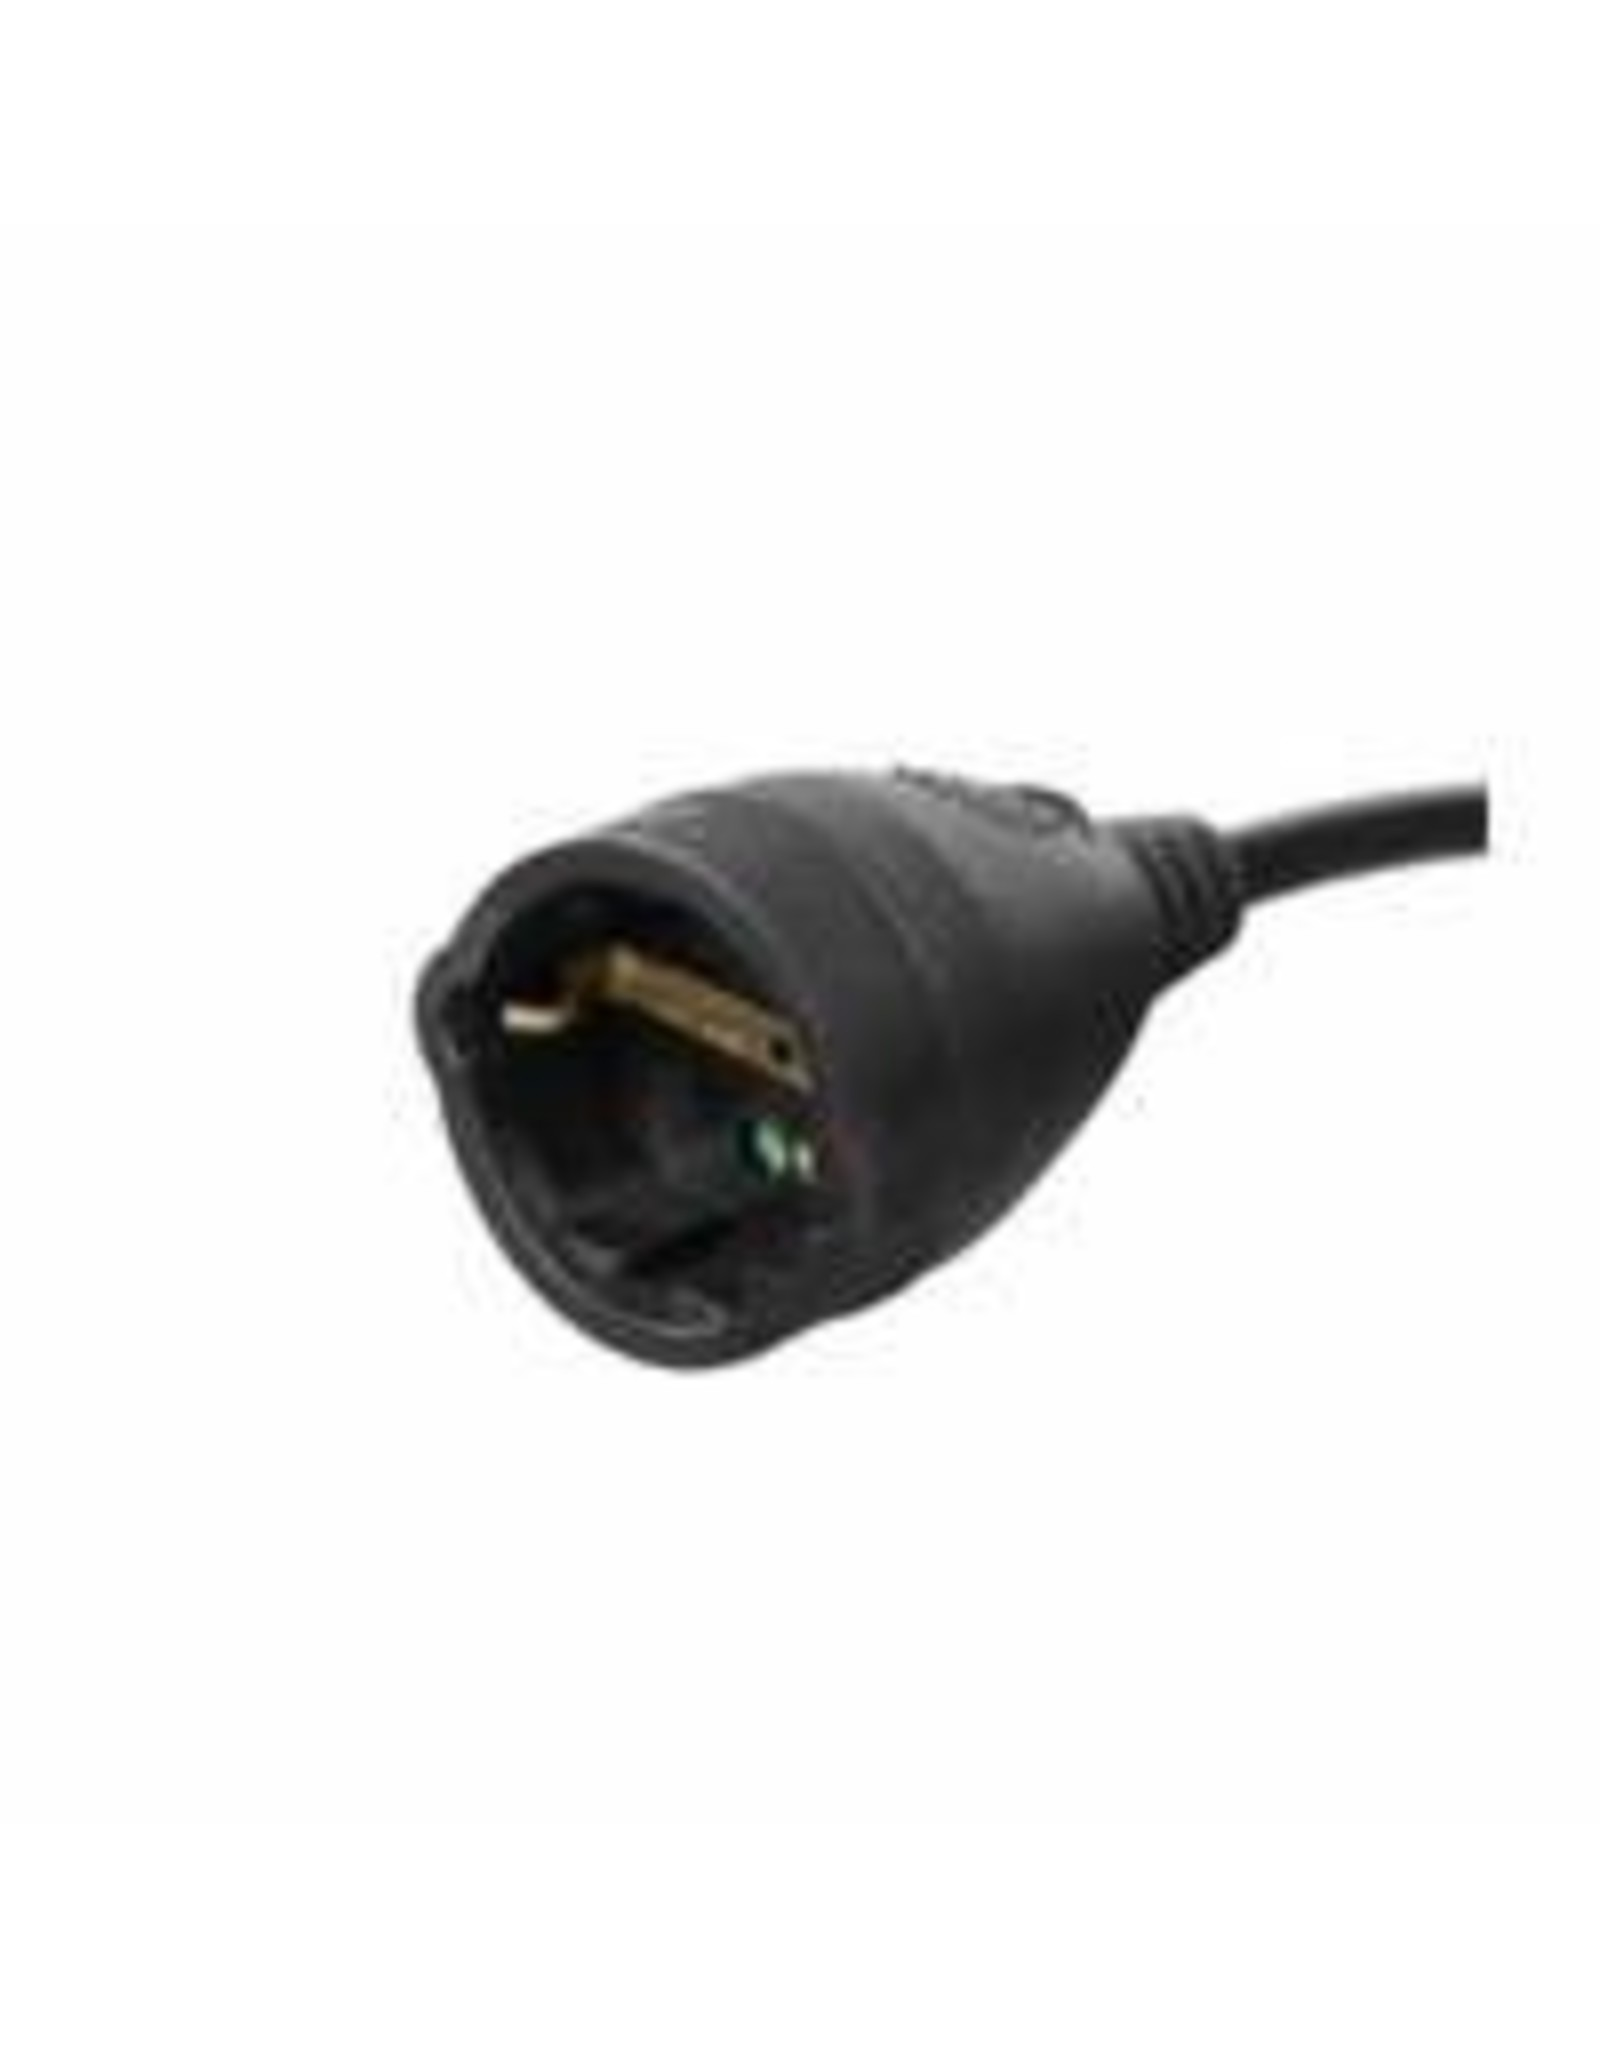 Ewent Extension cable German version 3m, black